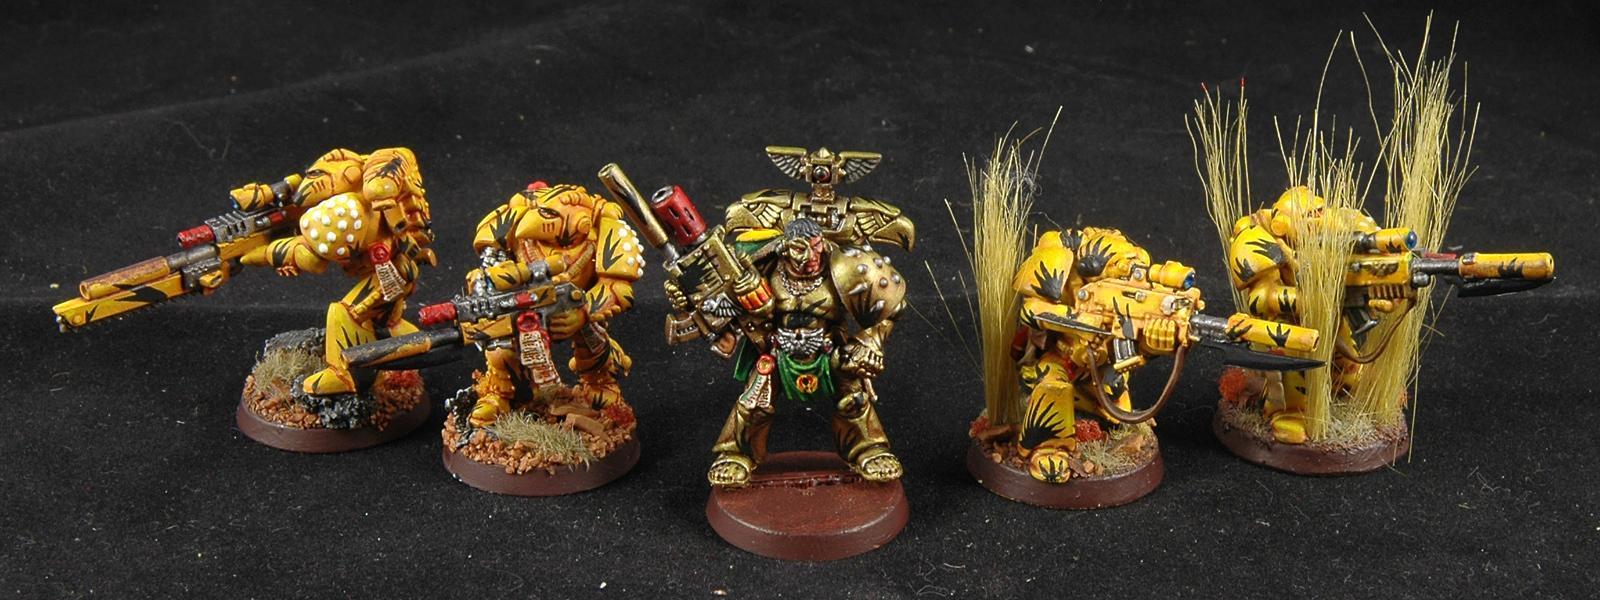 Mantis Warriors, Space Marines, Sternguard, Tycho, Warhammer 40,000, Work In Progress